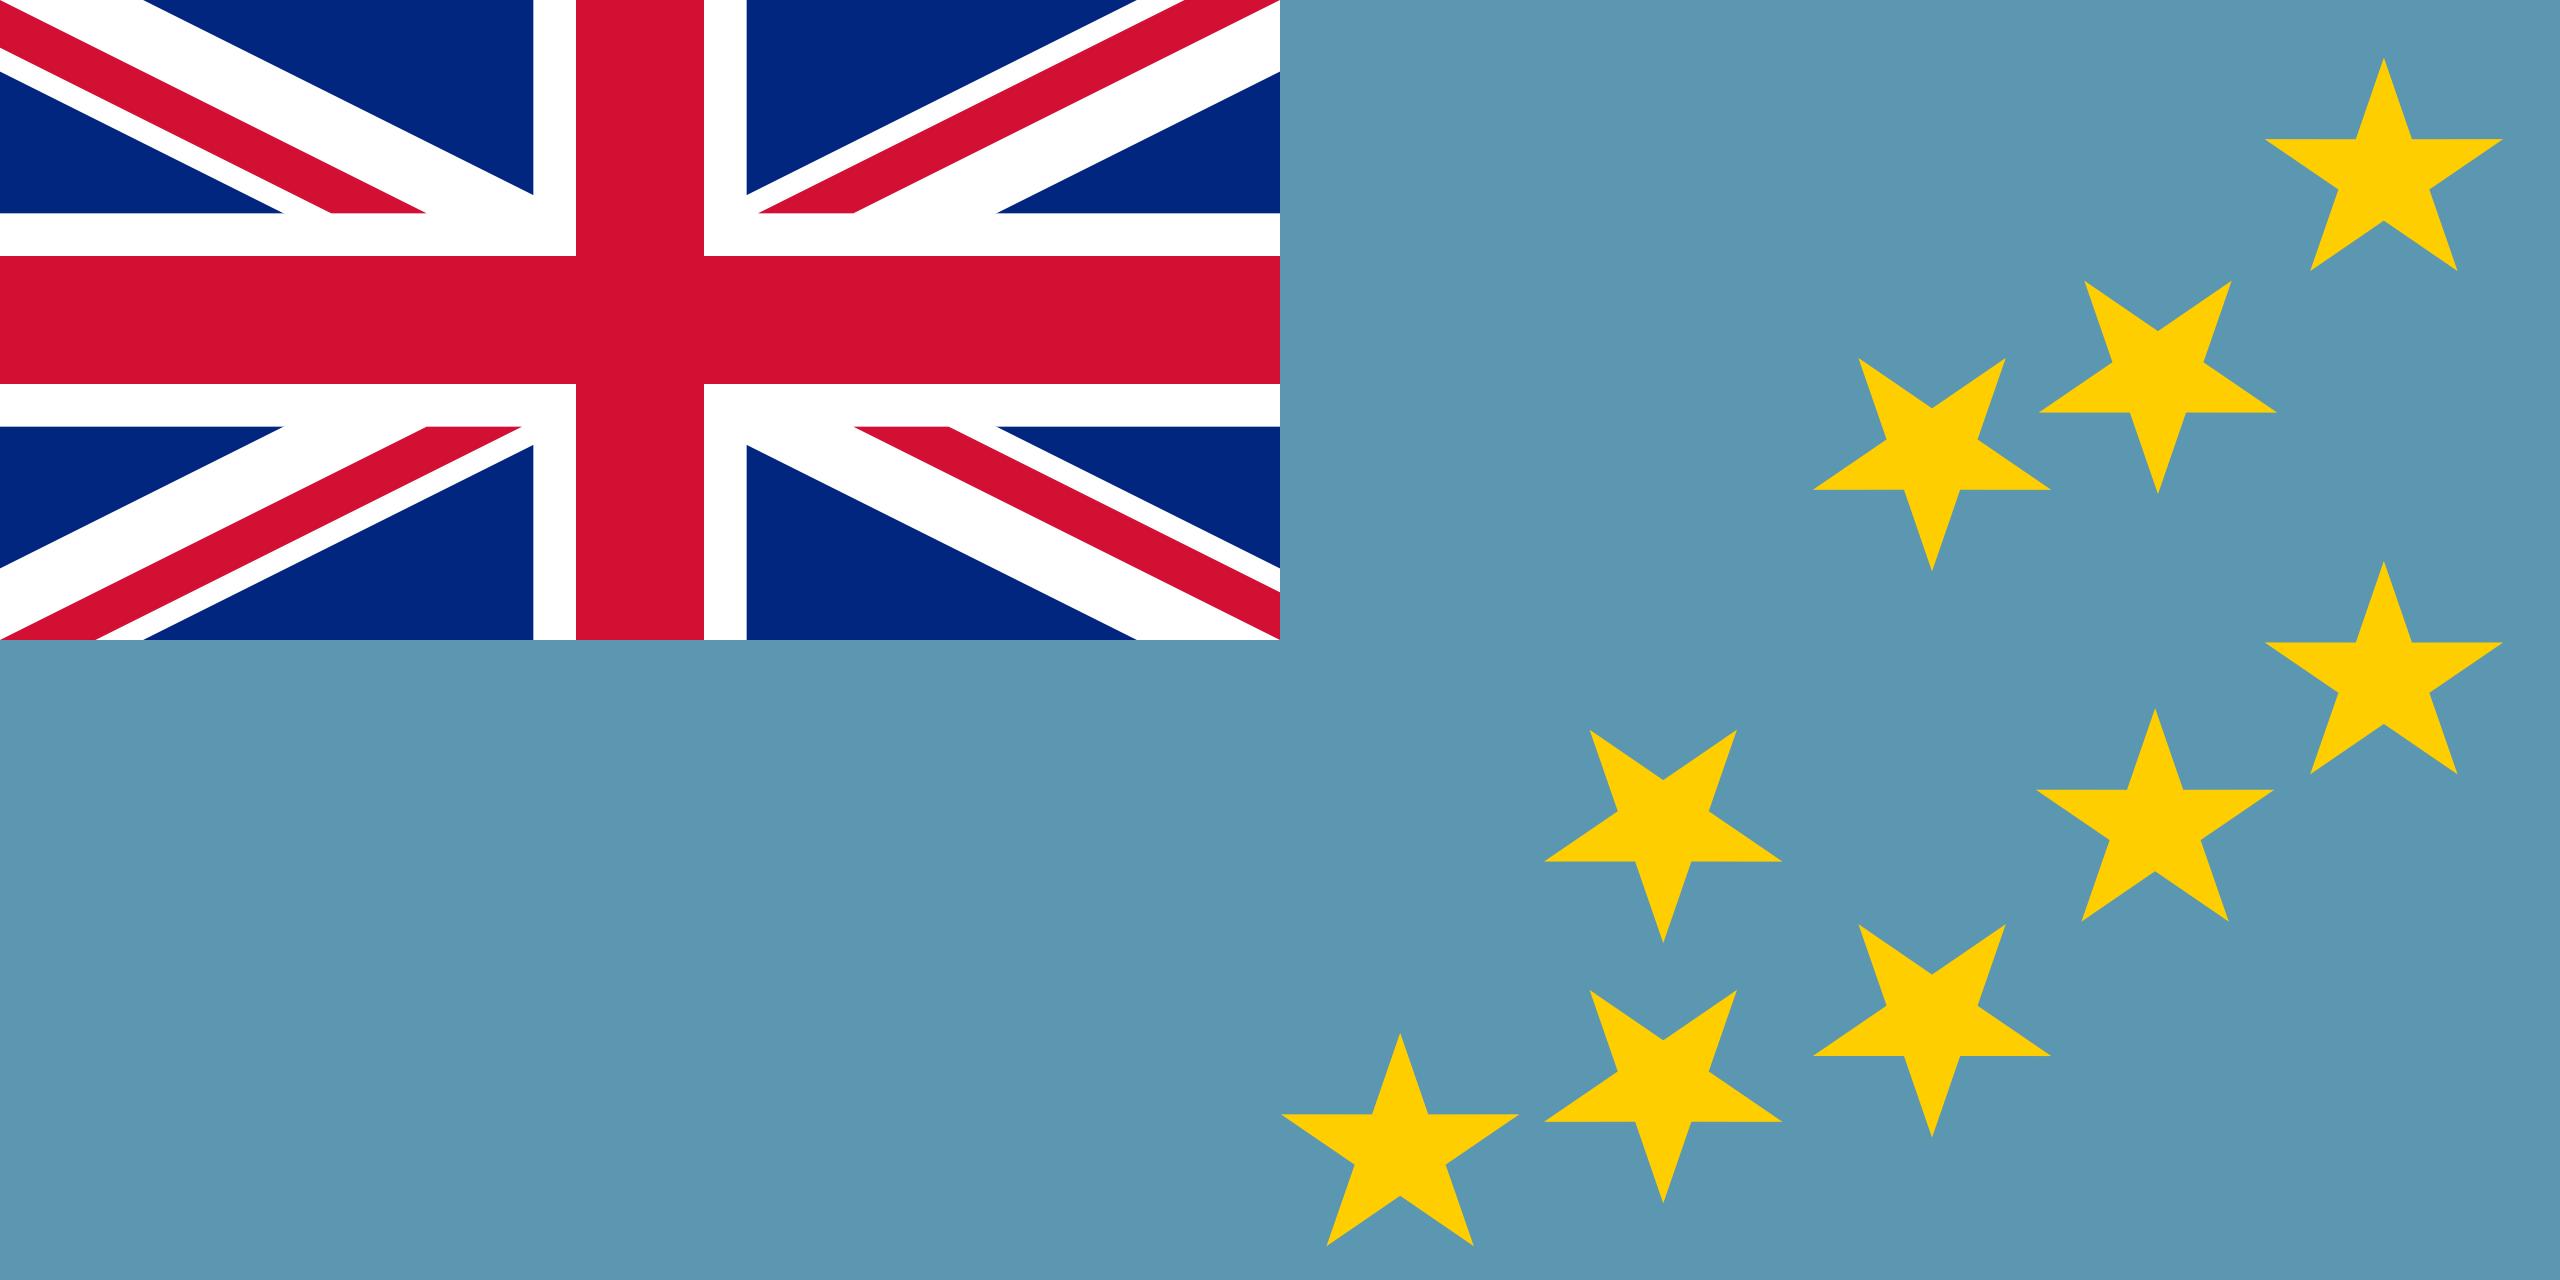 Tuvalu, Land, Emblem, Logo, Symbol - Wallpaper HD - Prof.-falken.com